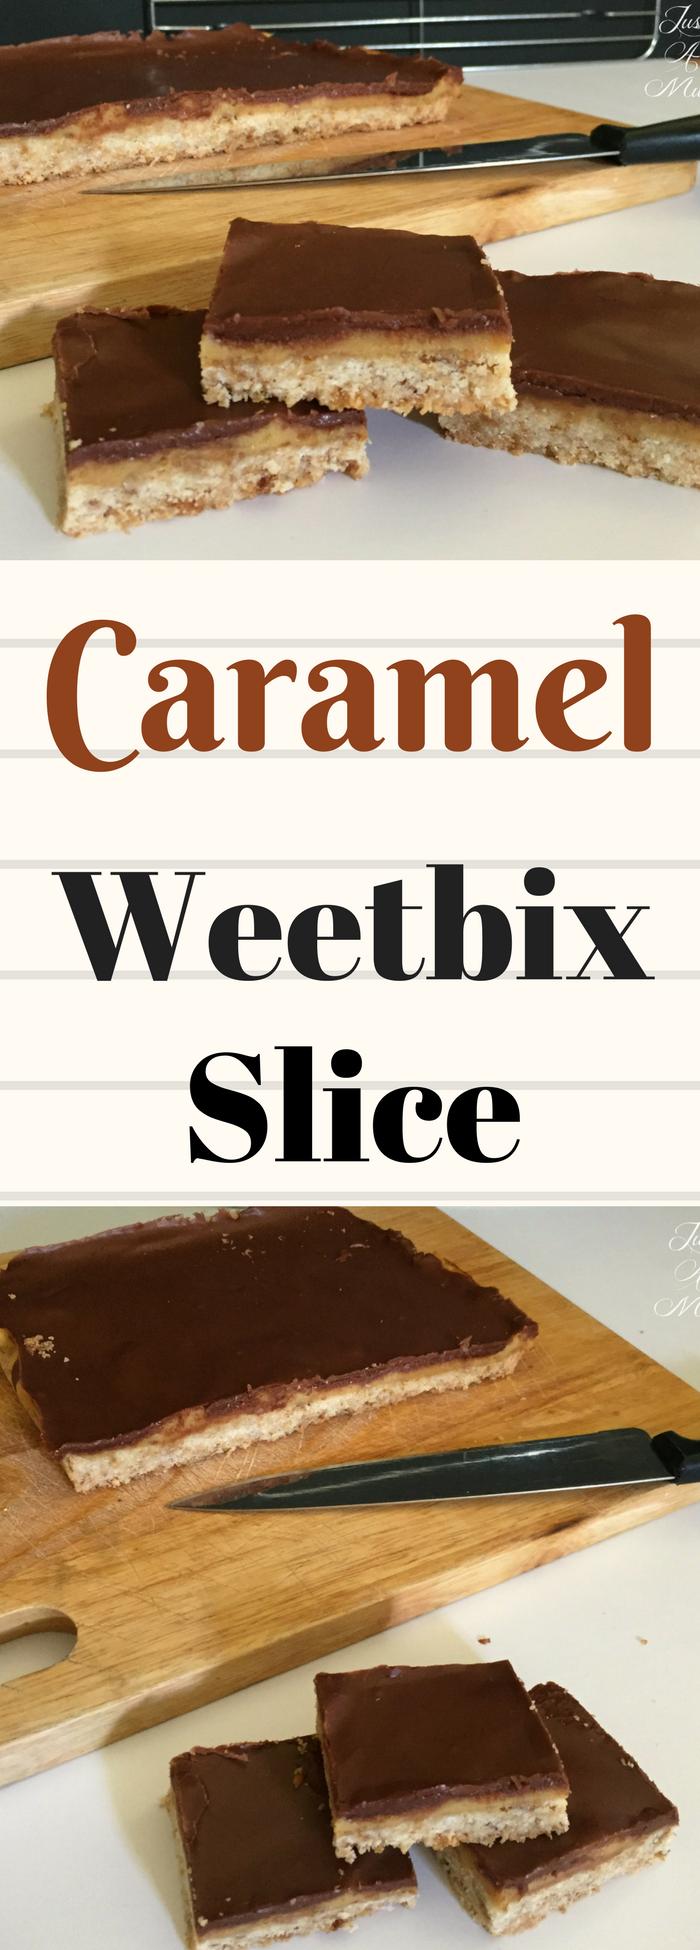 Chocolate Cake With Weetbix